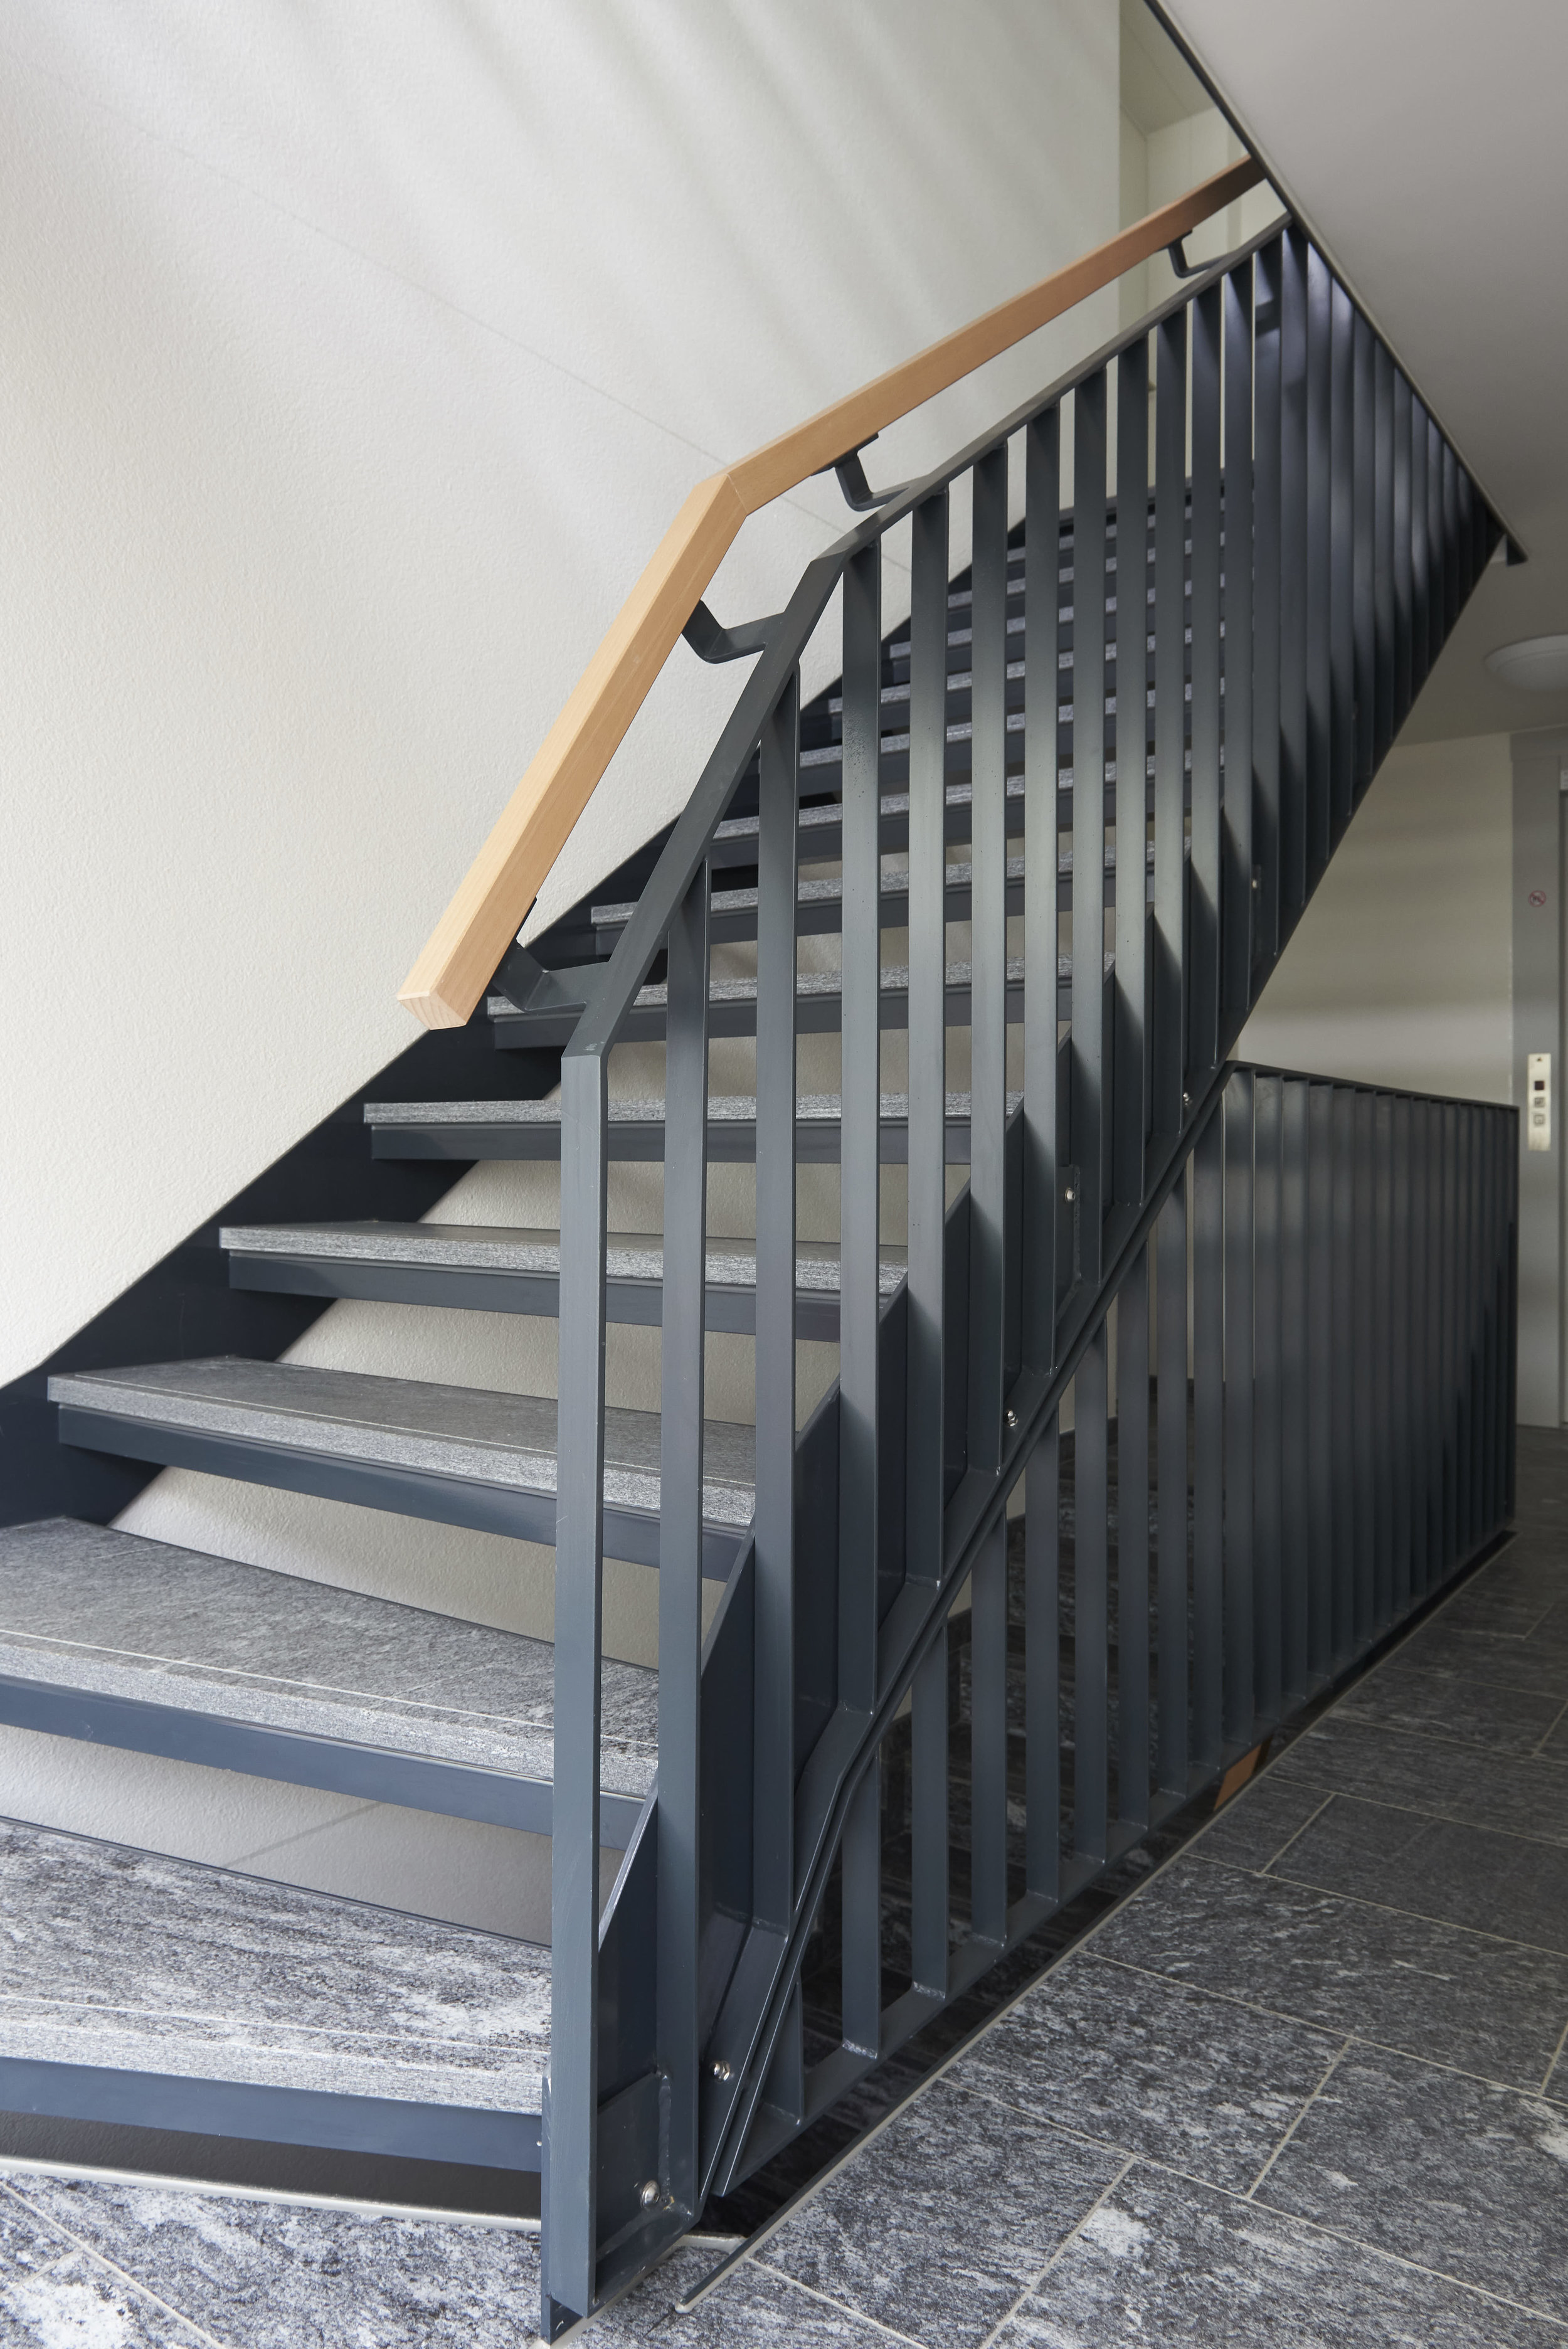 Treppe Stahl-Stein-Holz Kombination